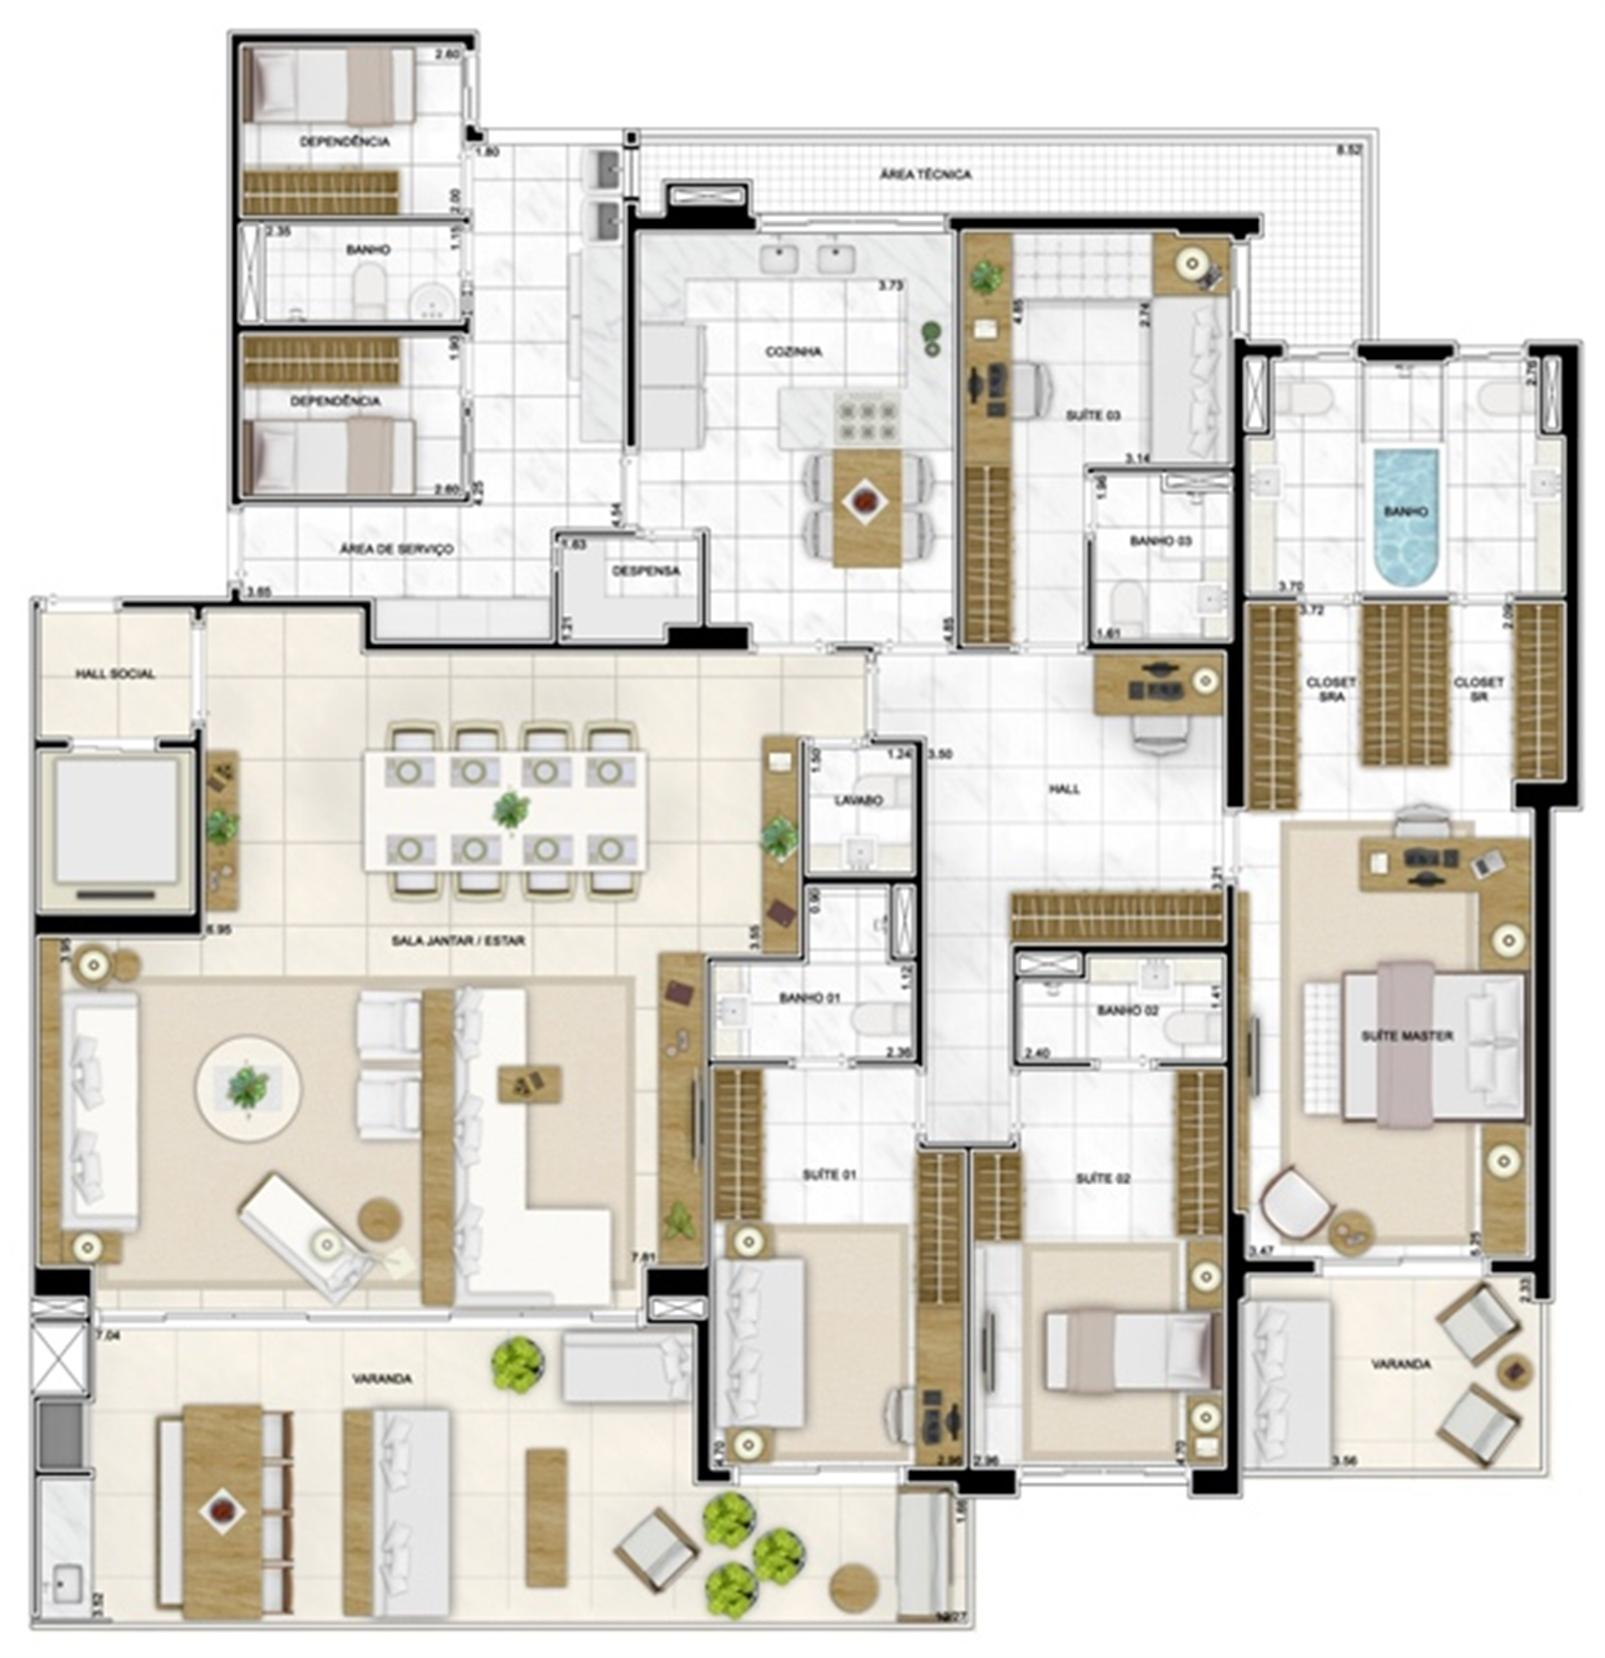 Planta Tipo 282 m² | Infinity Areia Preta – Apartamentona  Areia Preta - Natal - Rio Grande do Norte